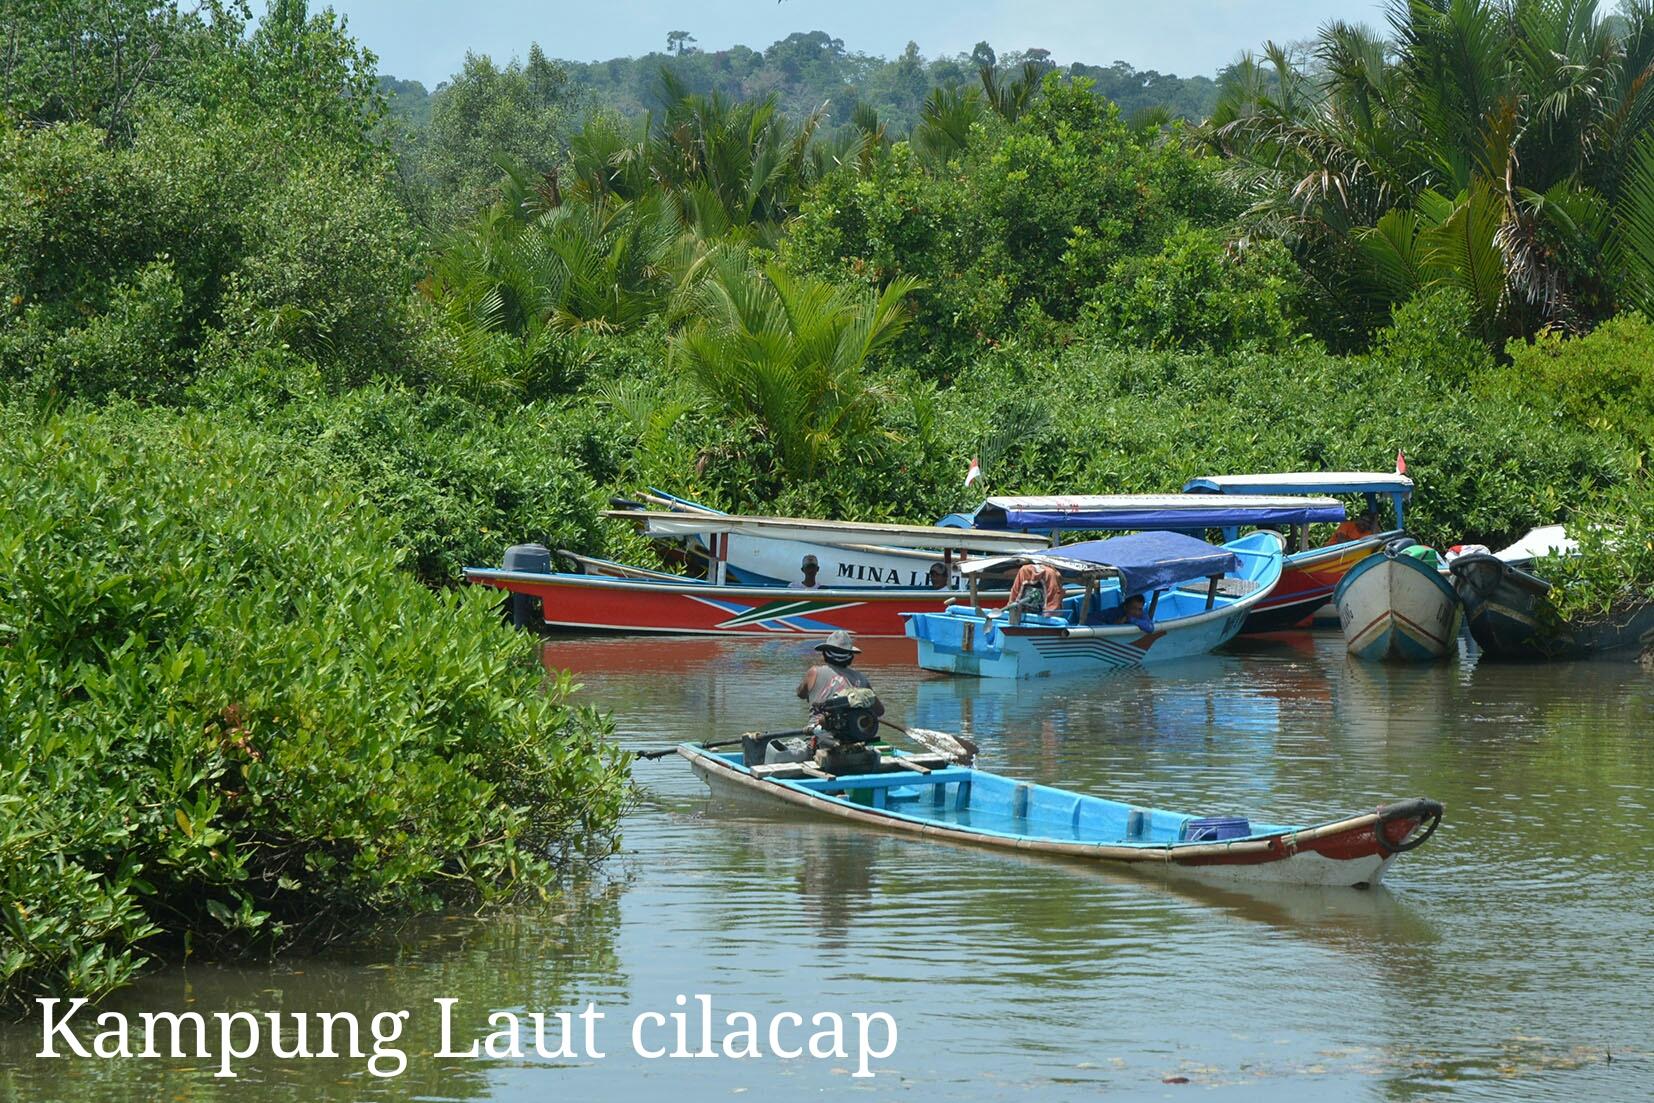 25 Objek Wisata Kabupaten Cilacap Jawa Tengah Terpopuler Jelajah Satu